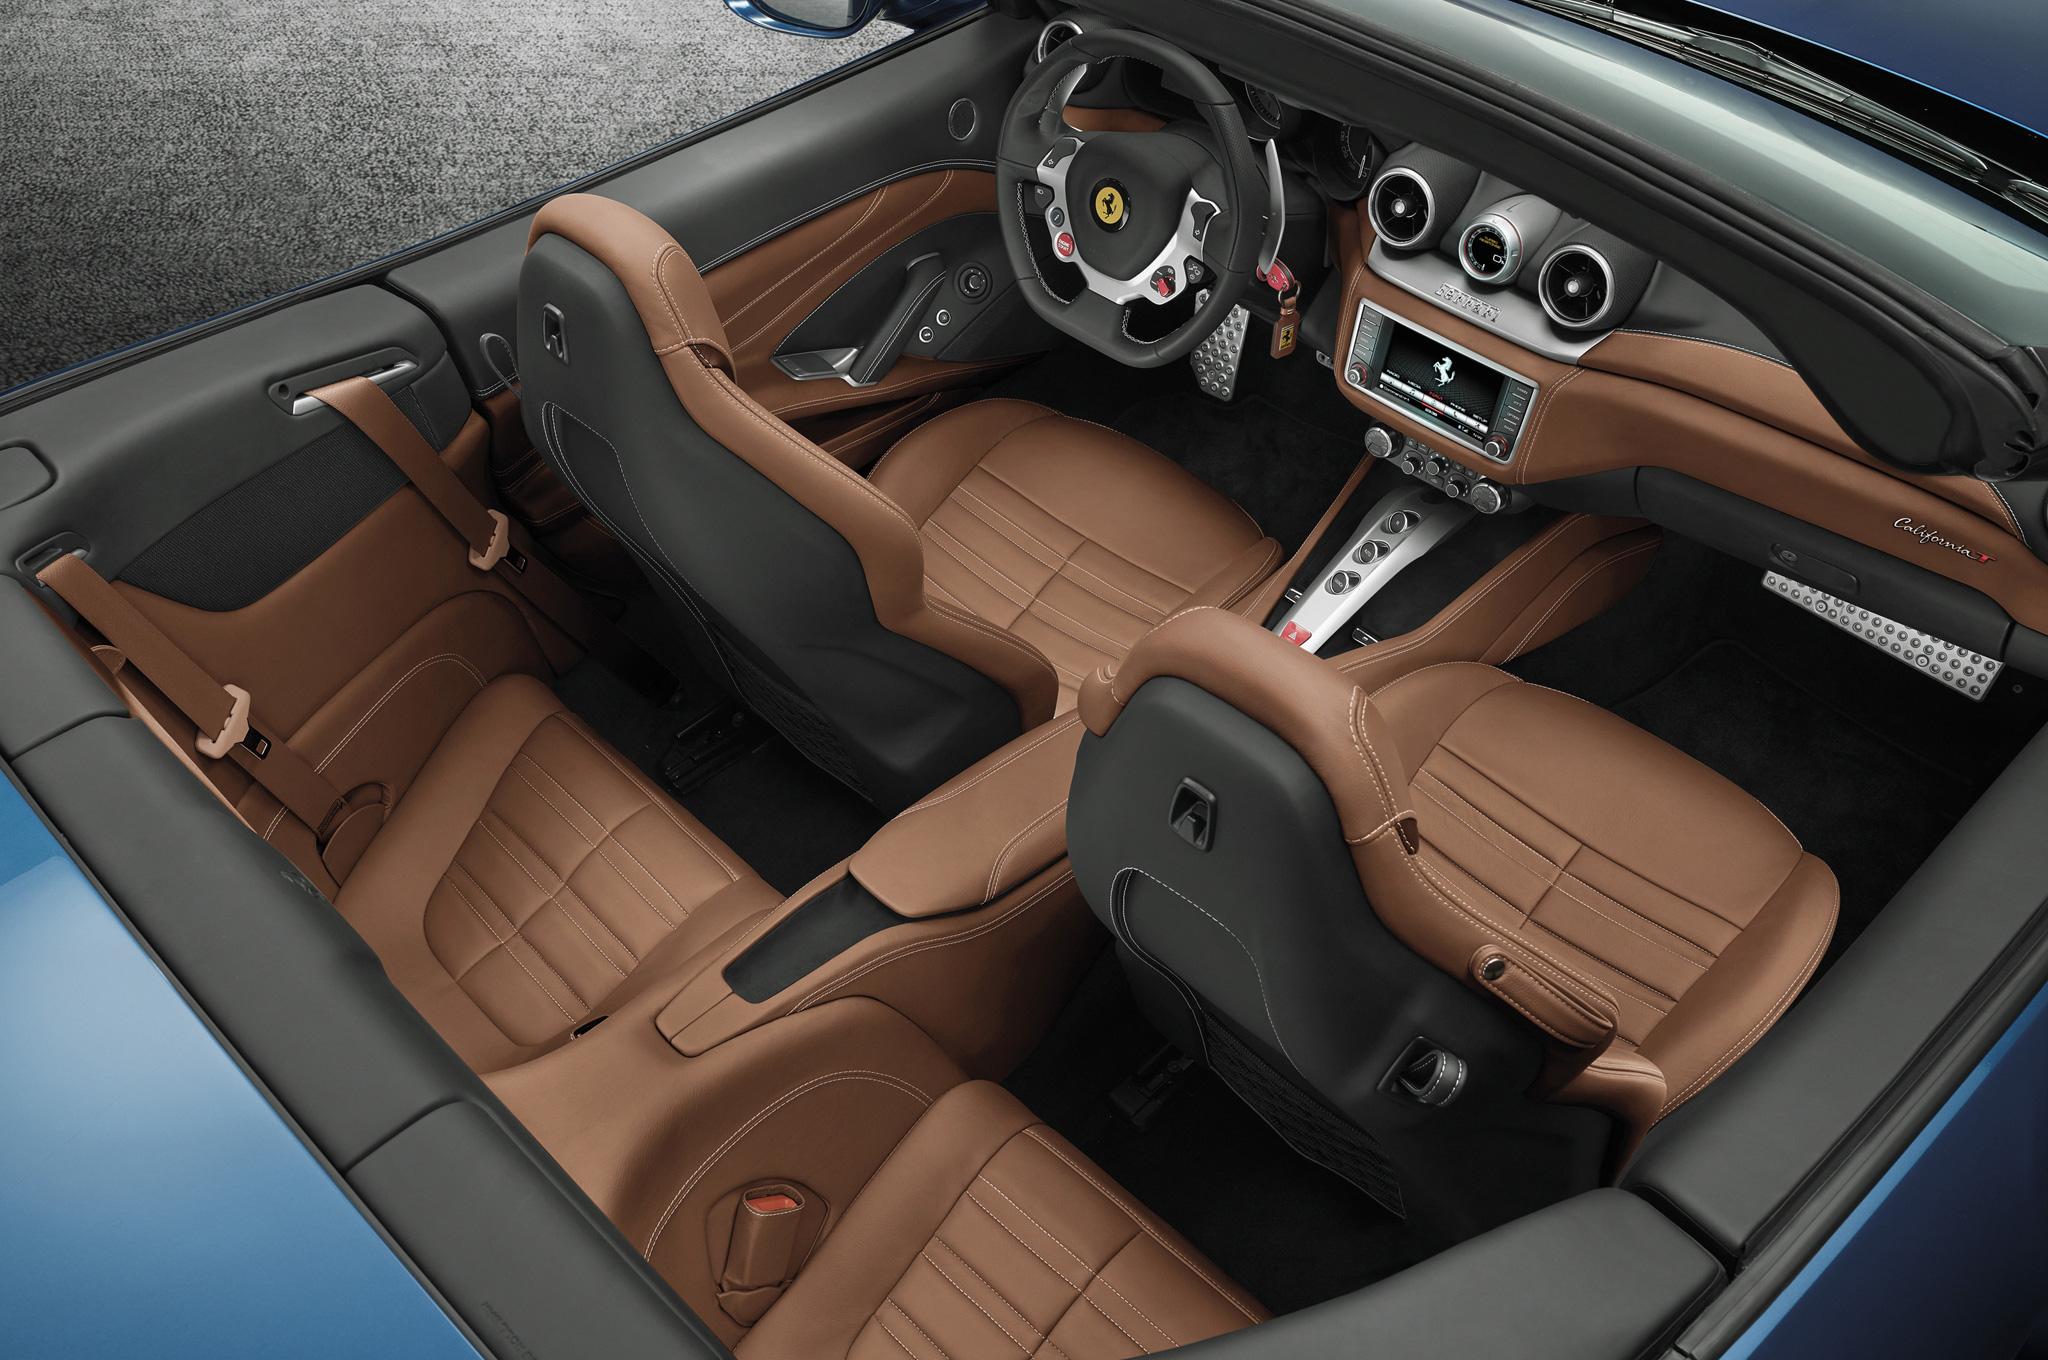 2015-Ferrari-California-T-interior-from-above